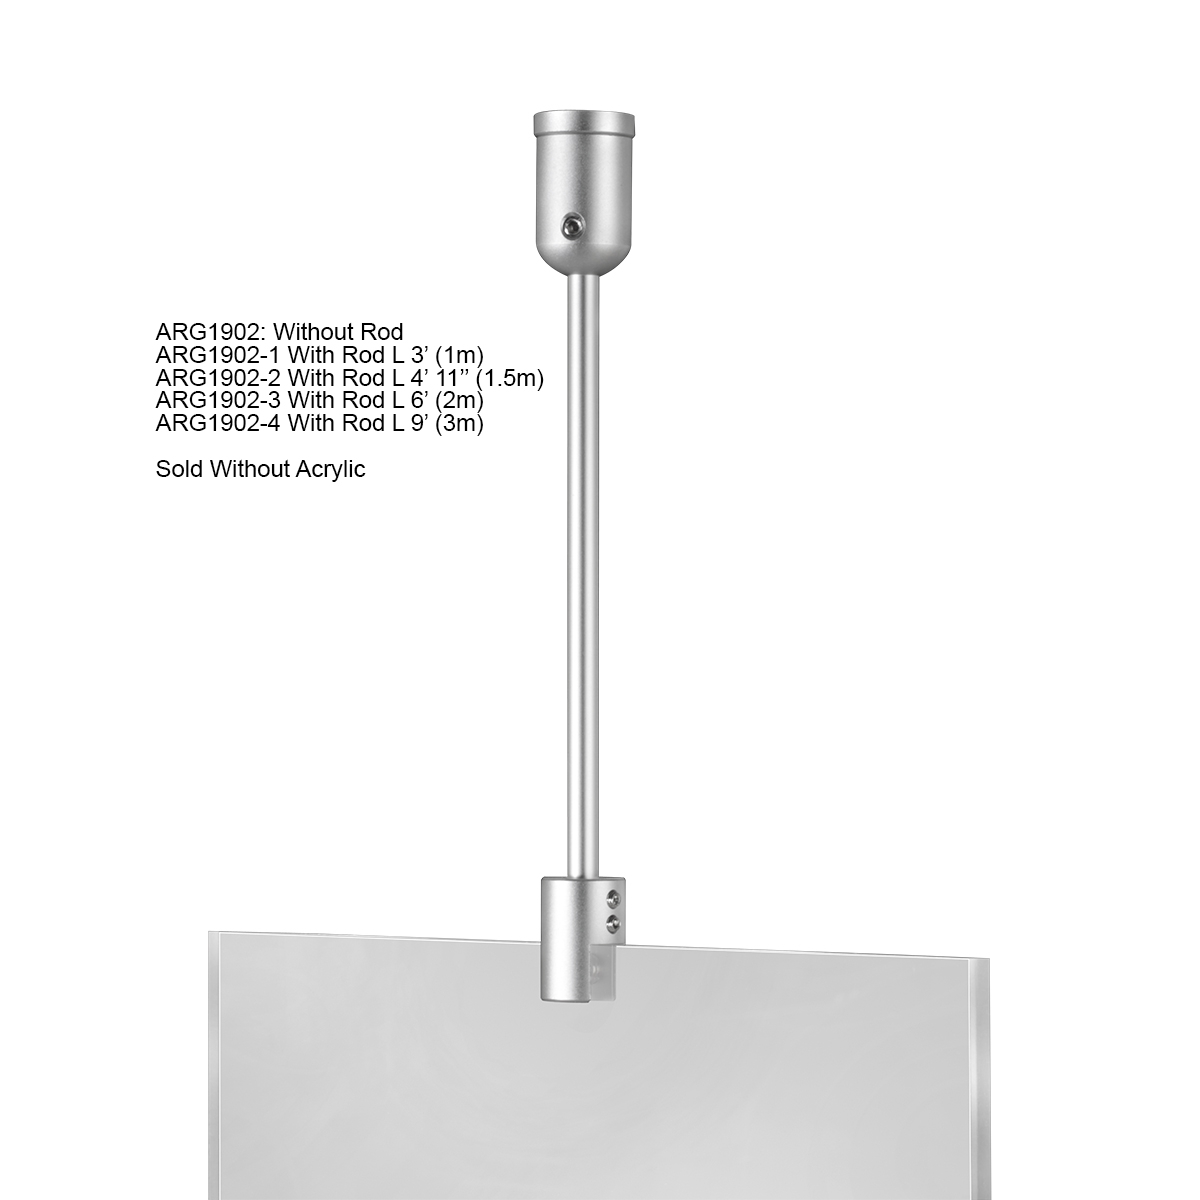 Ceiling Suspended Rod Kit - 3' - Aluminum